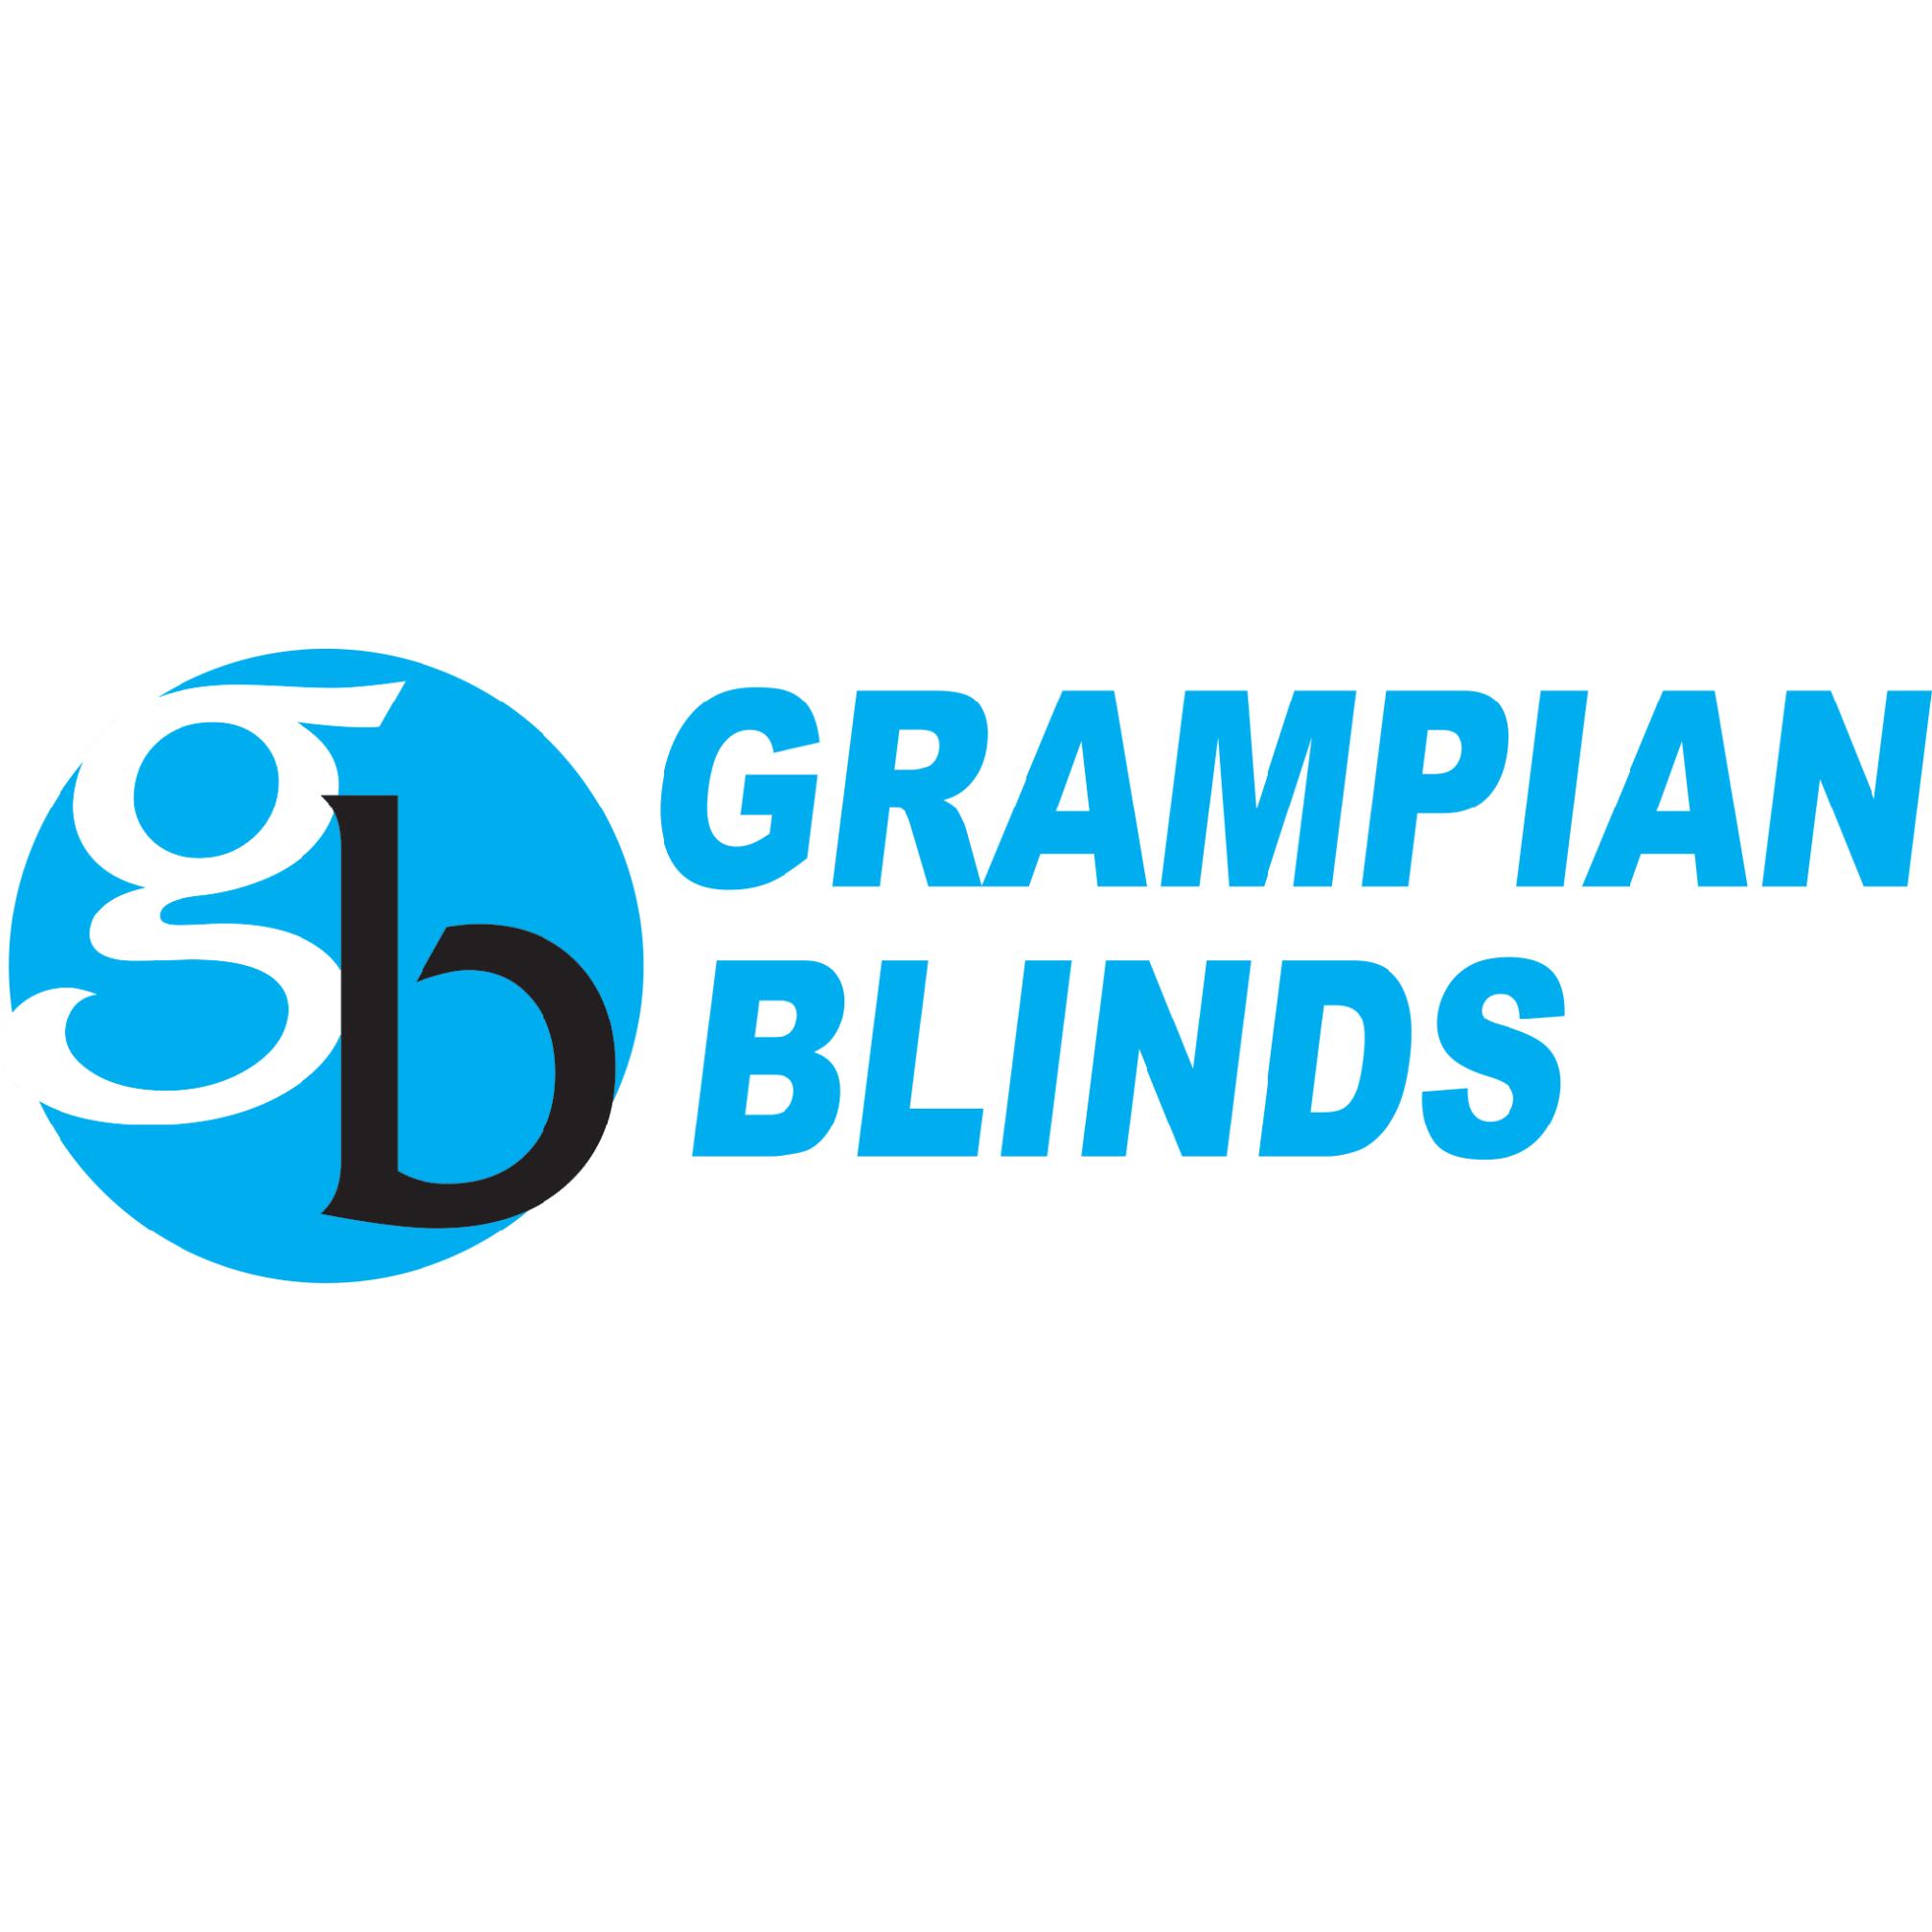 Grampian Blinds Ltd